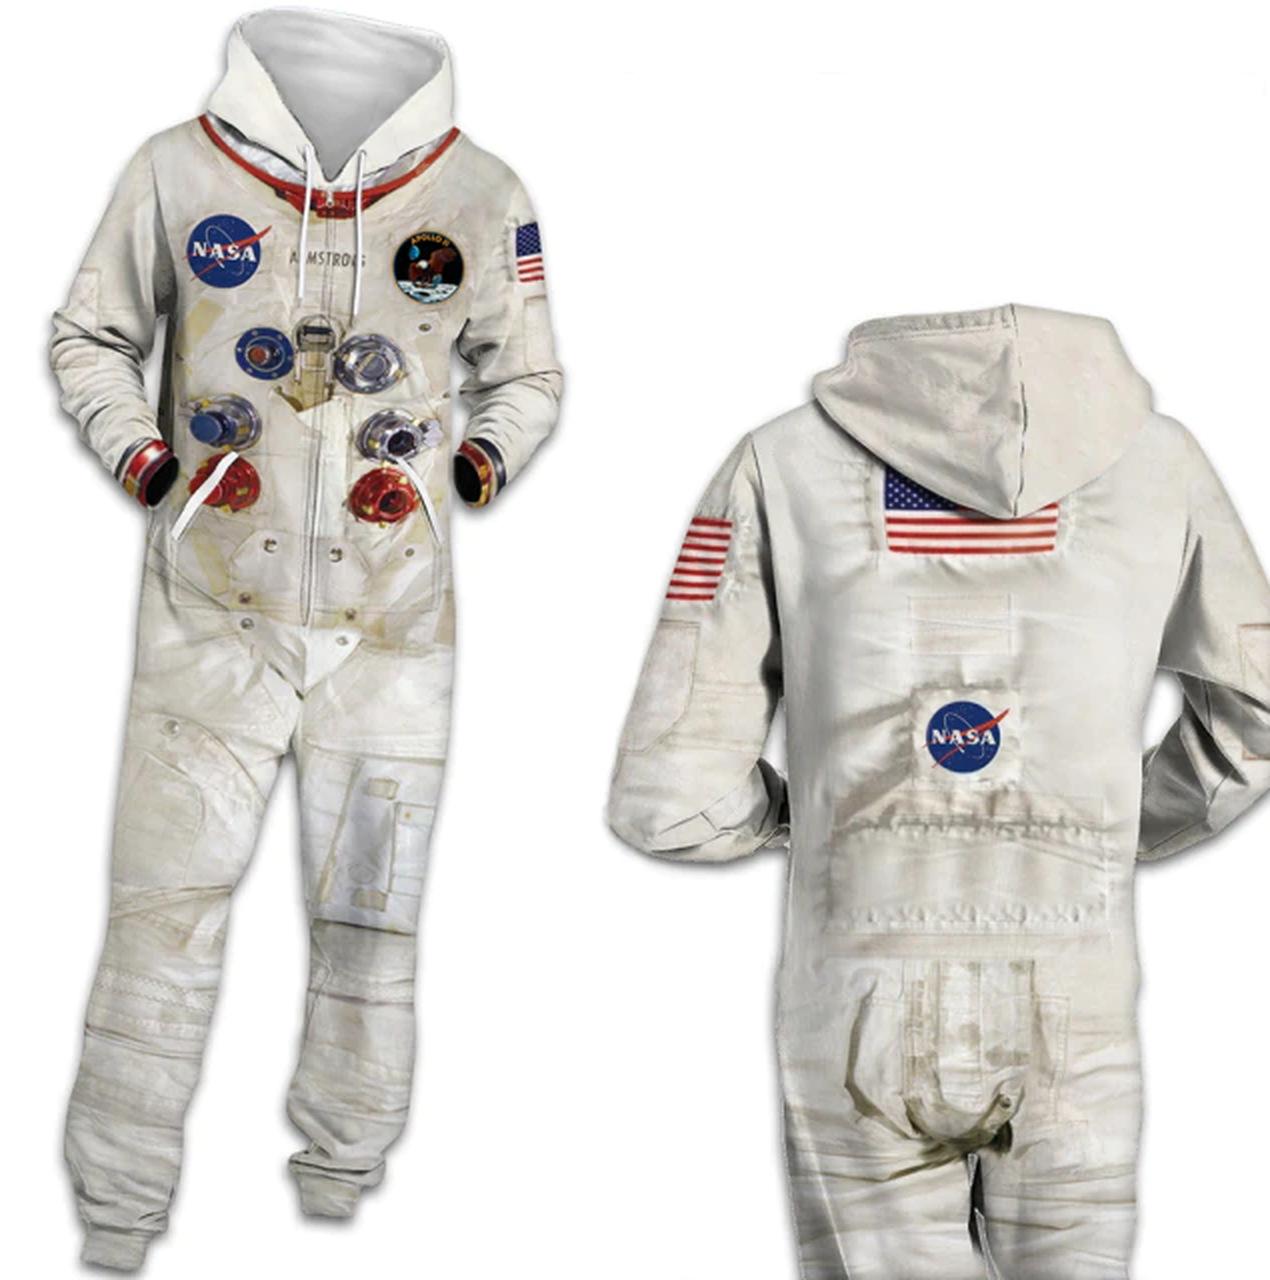 Pijama Macacão Adulto Unissex Astronauta NASA - EVALI